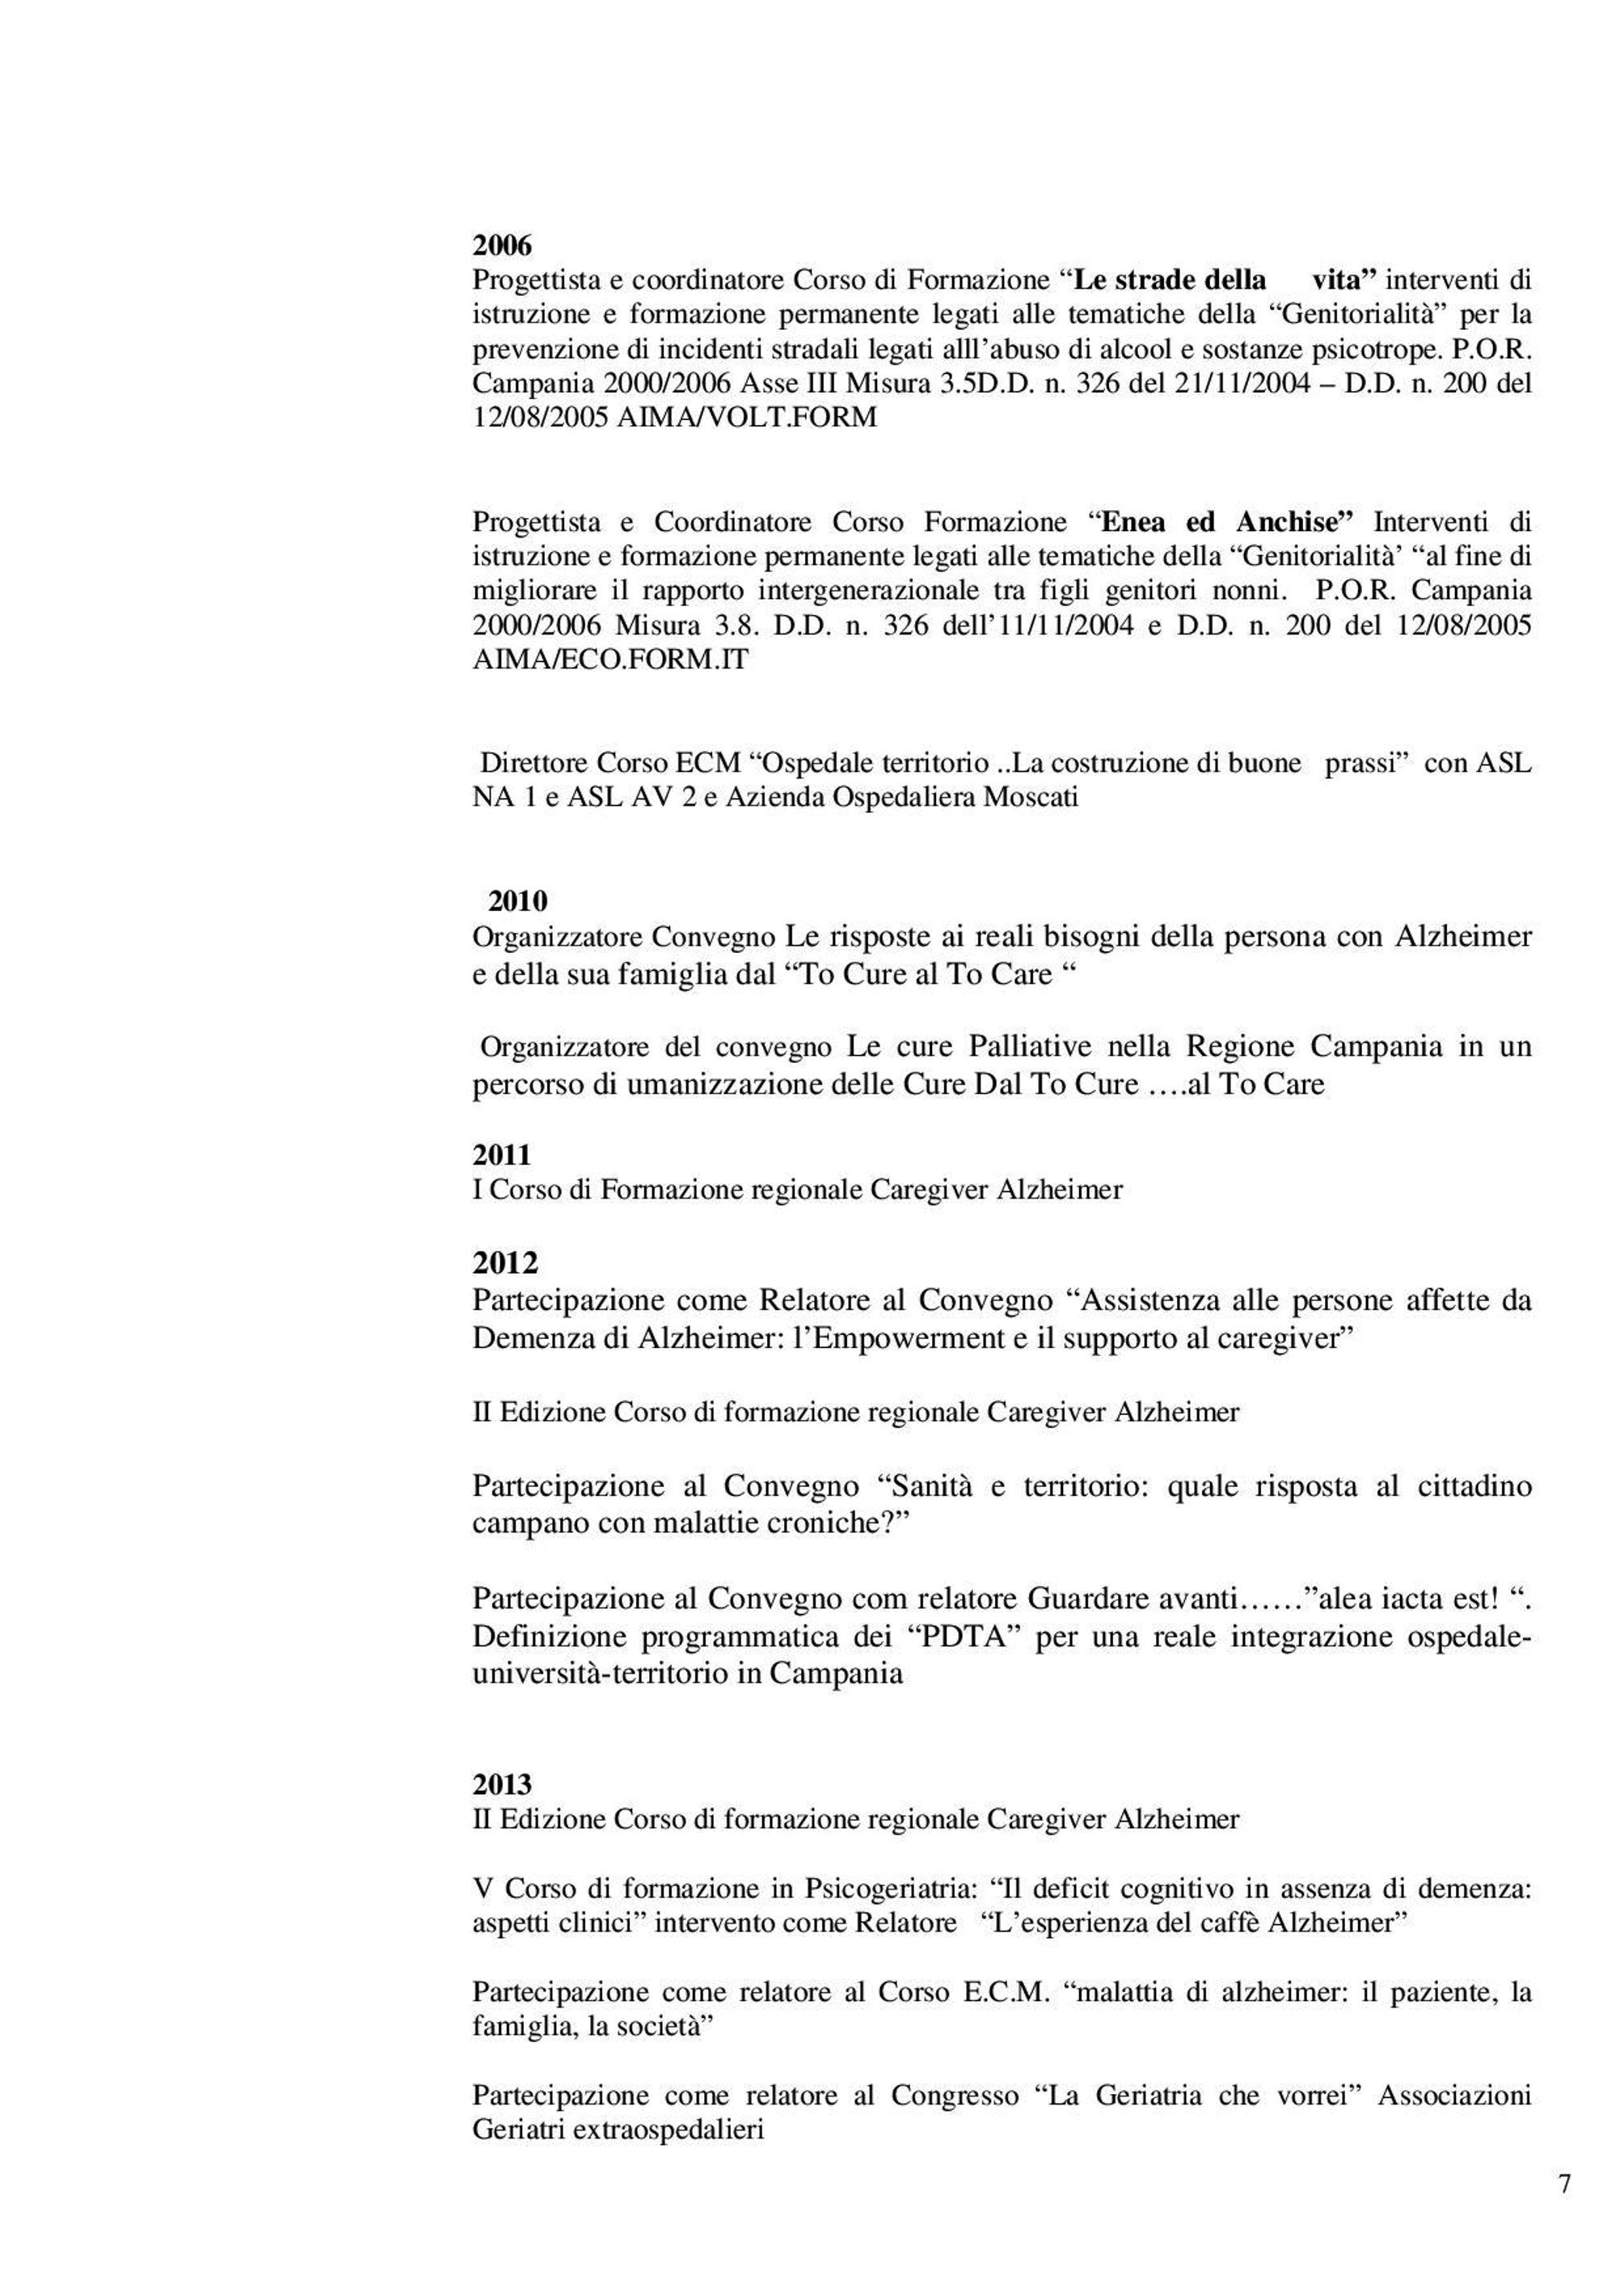 CUURICULUM MUSELLA FORMATO EUROPEO-page-007